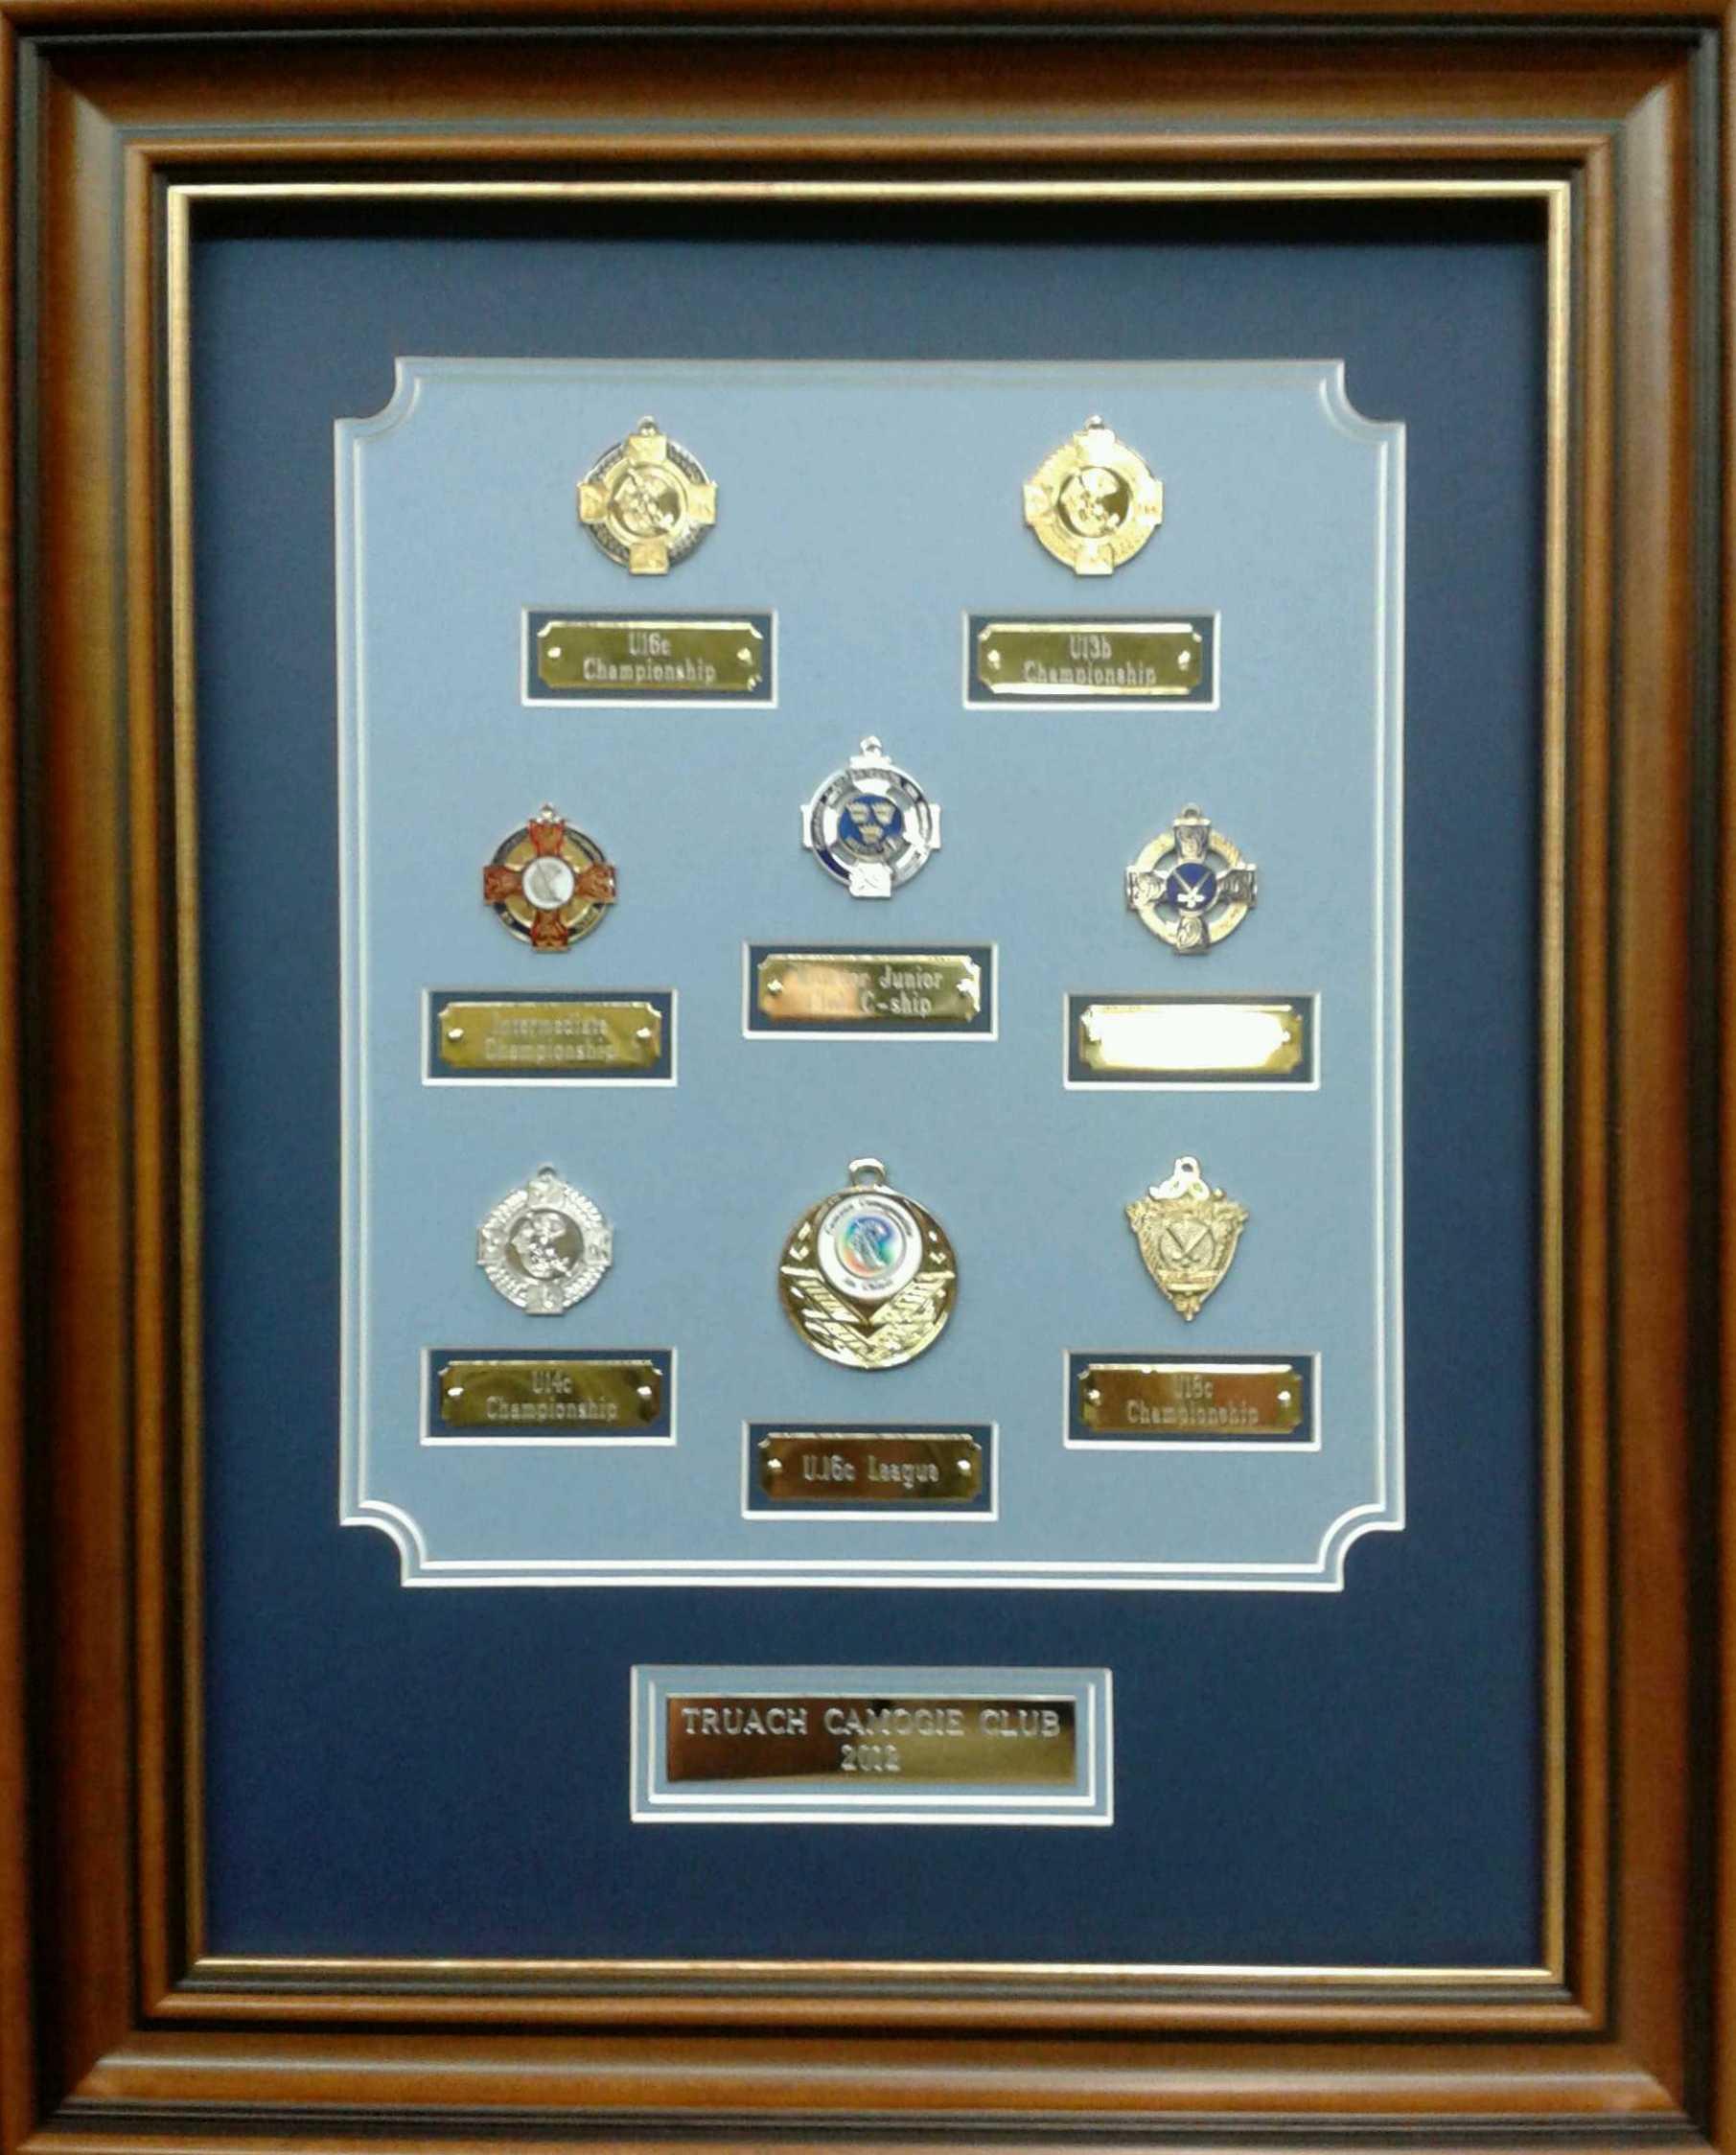 Framed GAA Medals